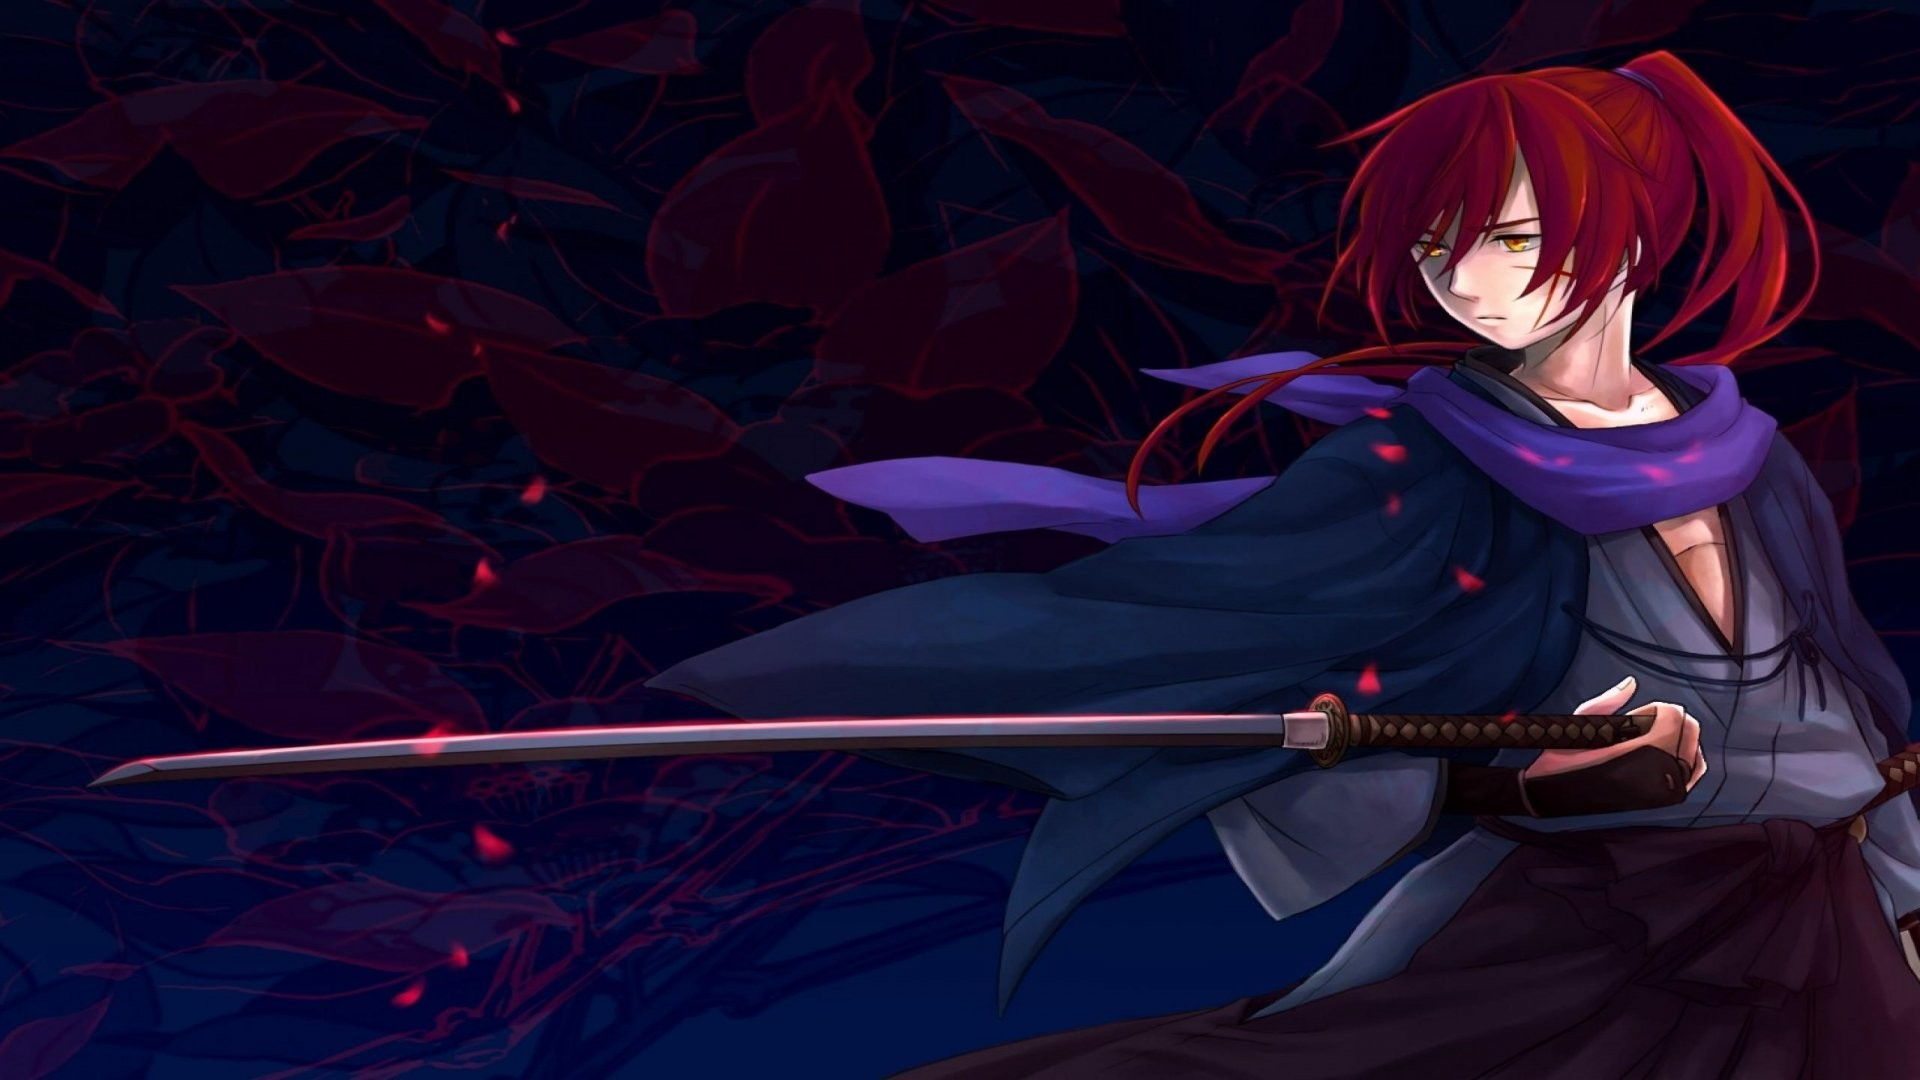 Rurouni Kenshin warrior fantasy anime warrior japanese samurai action  fighting martial wallpaper | | 604964 | WallpaperUP